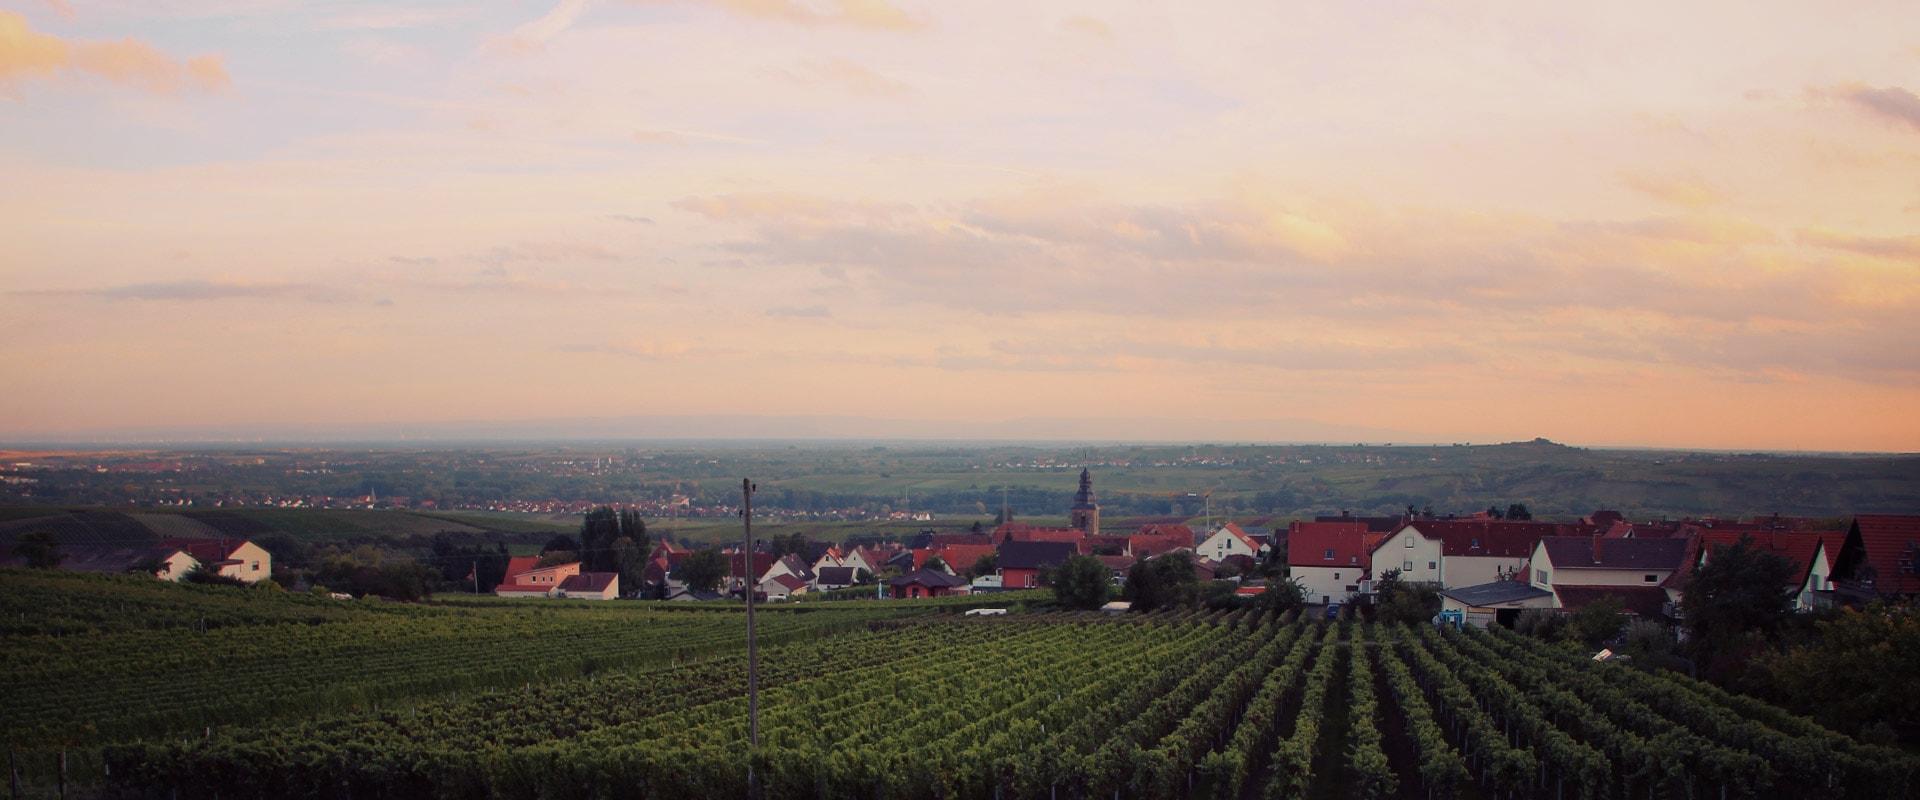 Weingut Lidy Weinreben Frankweiler Sonnenuntergang